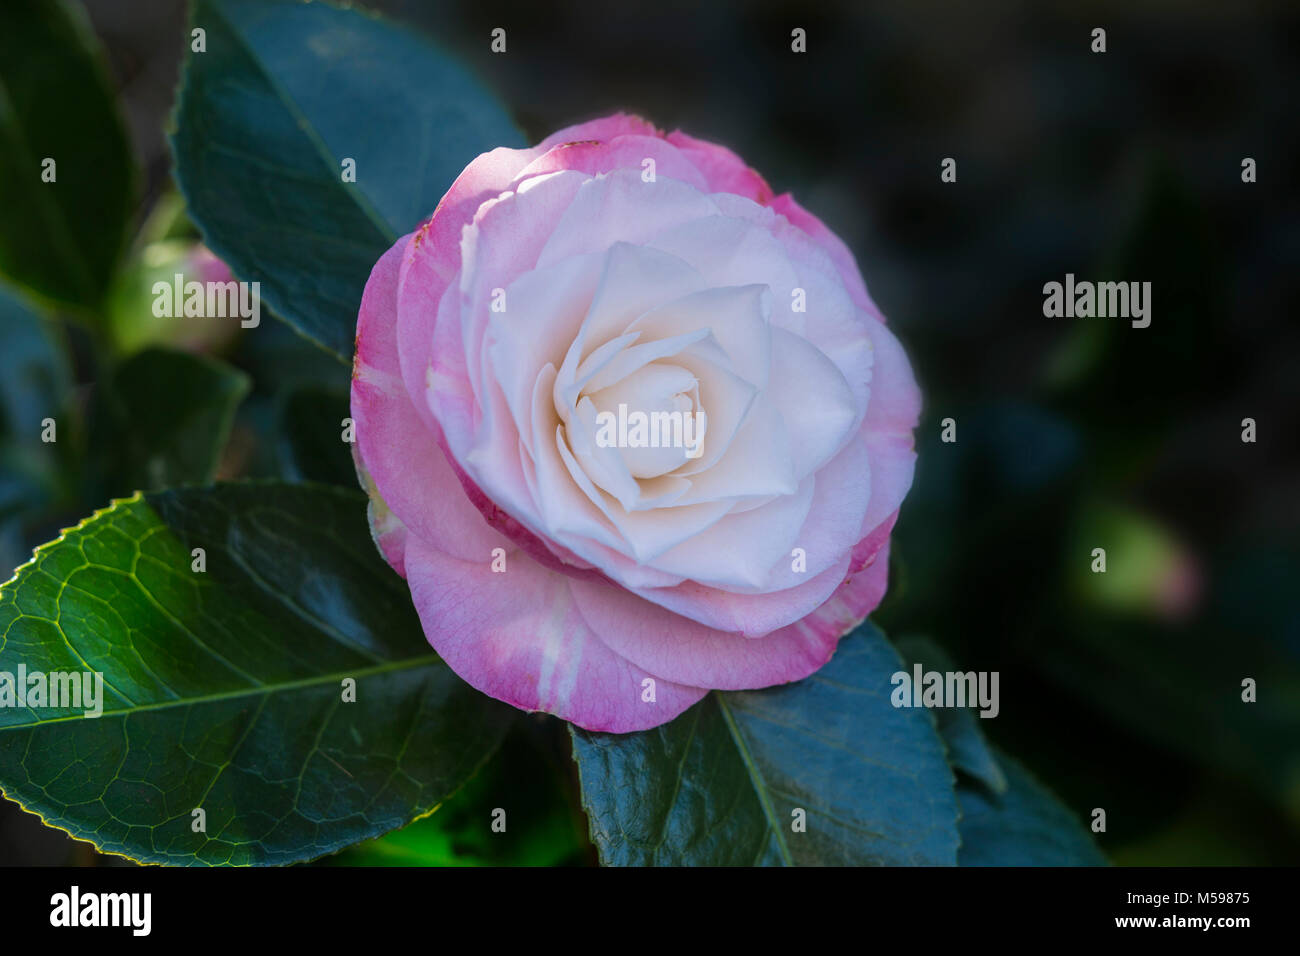 Camellia Japonica Desire in flower. - Stock Image